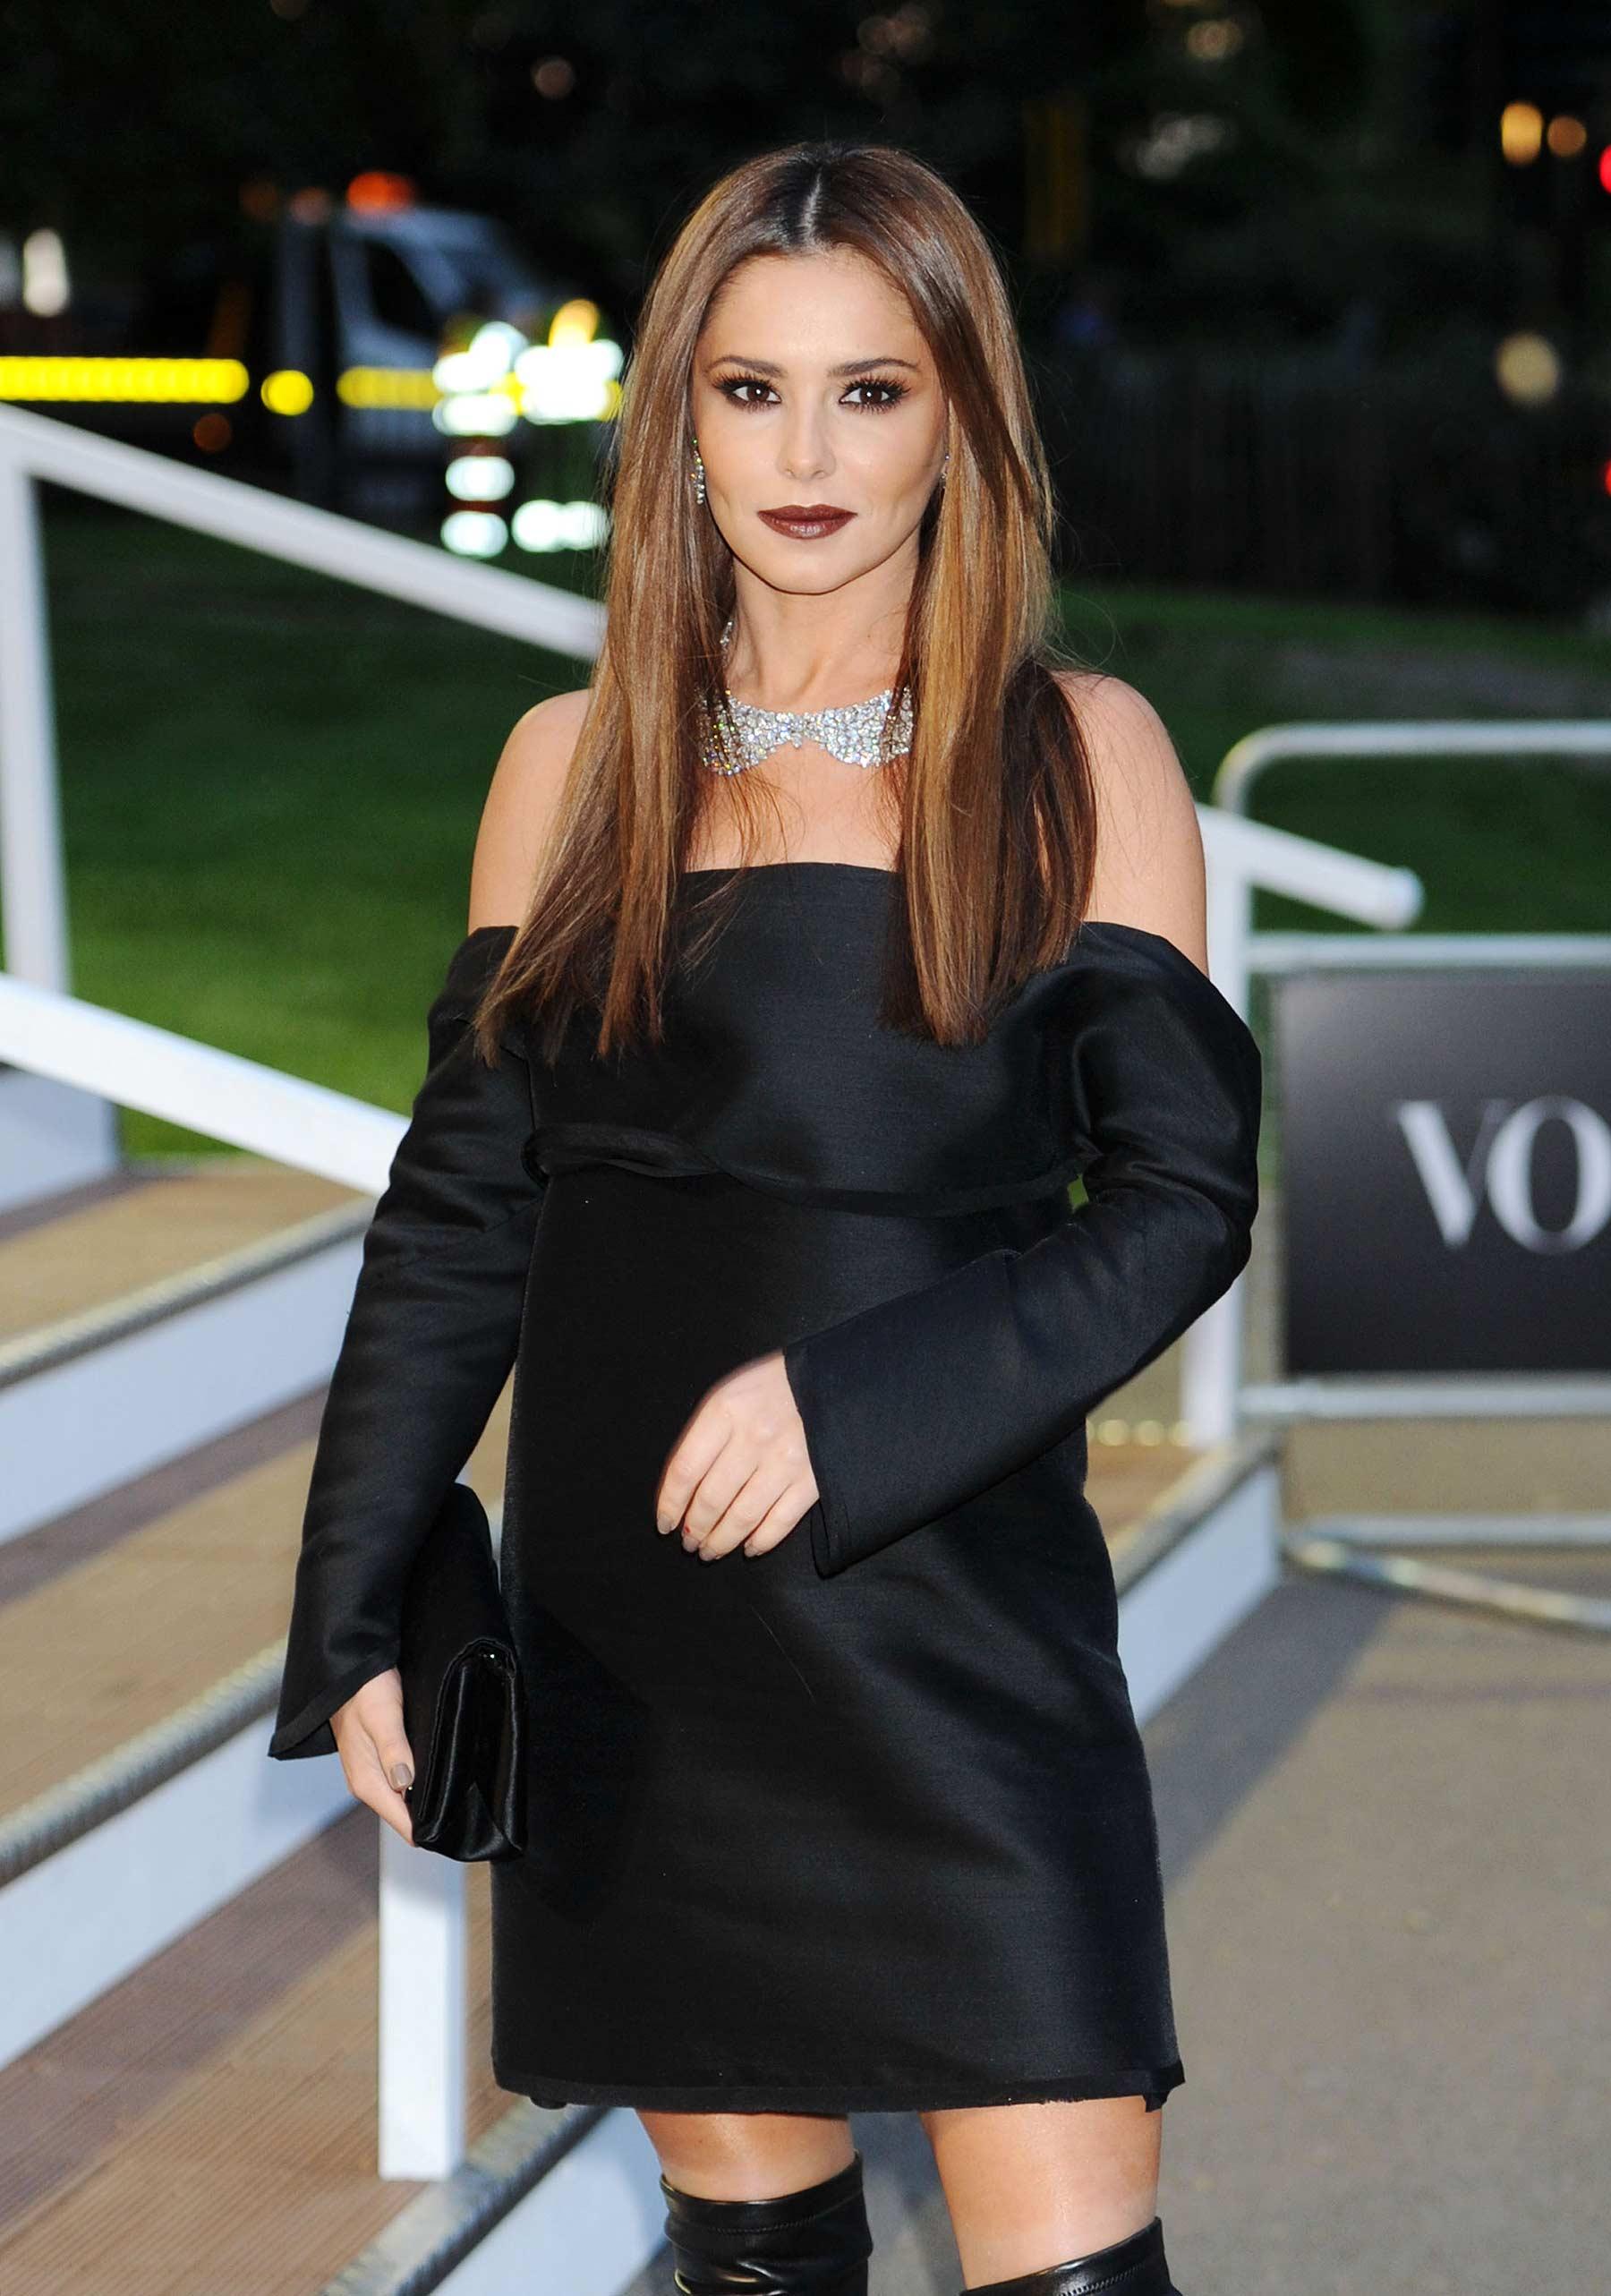 Cheryl Fernandez Versini attends British Vogue 100th Anniversary Gala